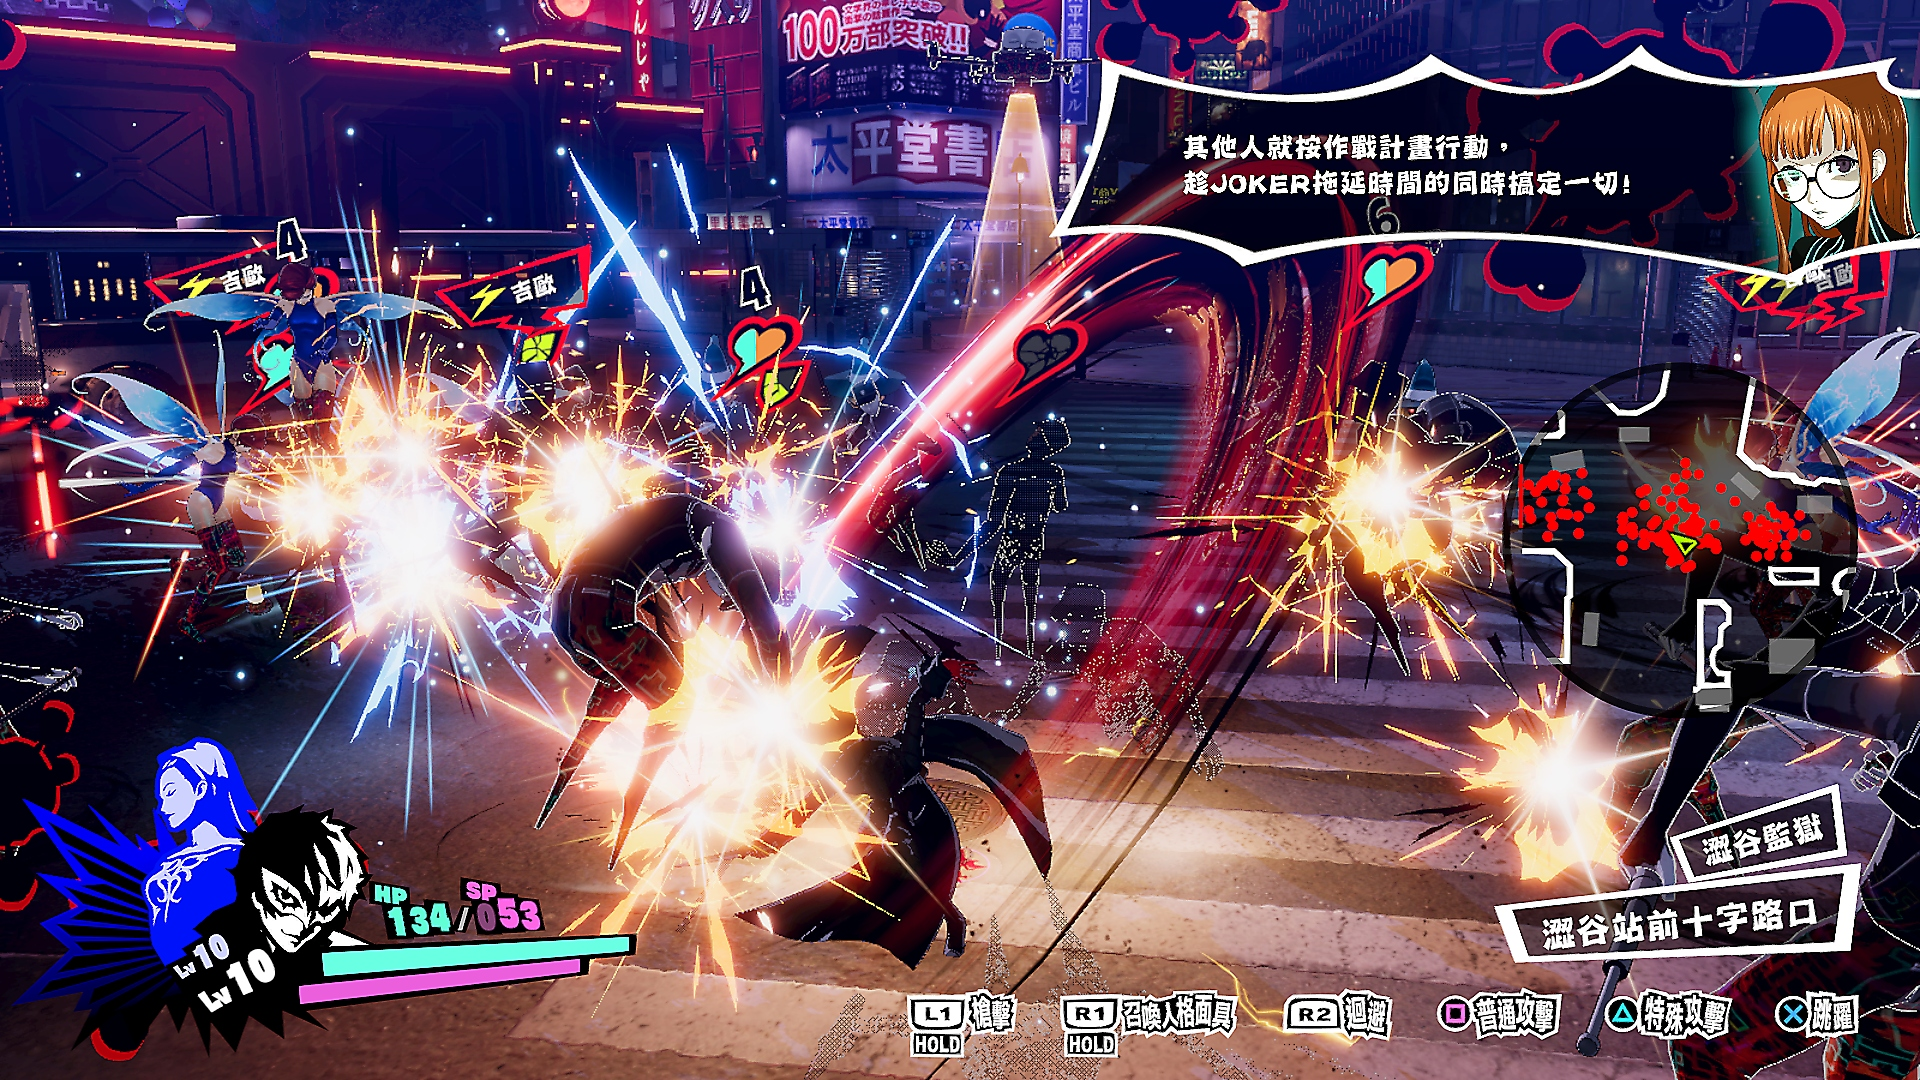 Persona 5 STRIKERS - Gallery Screenshot 1